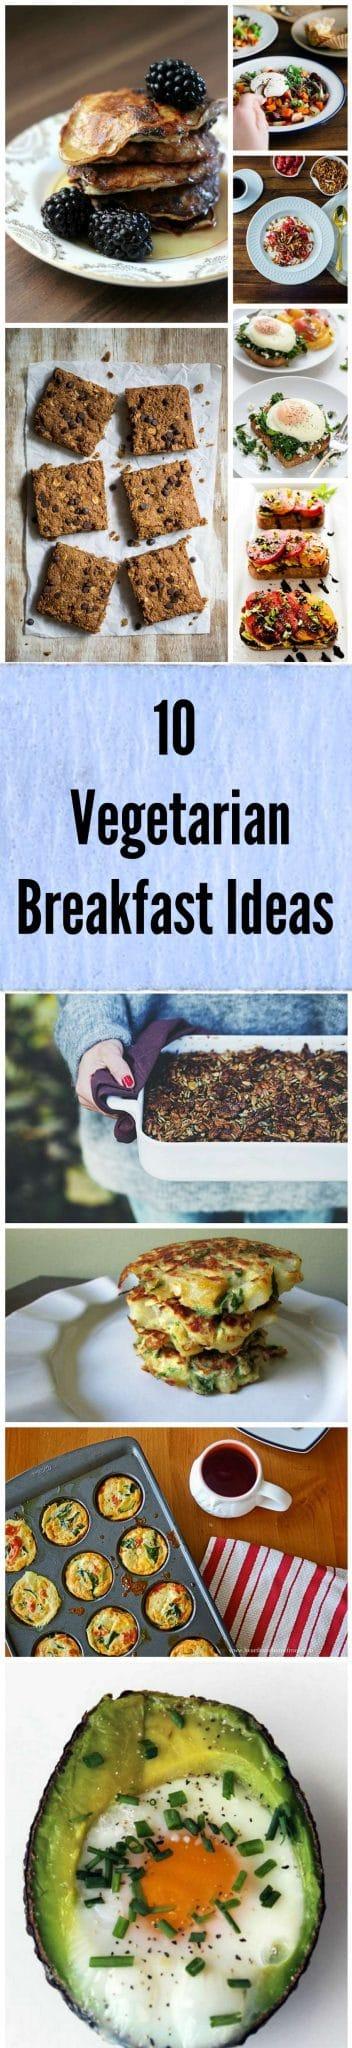 easy vegetarian breakfast ideas